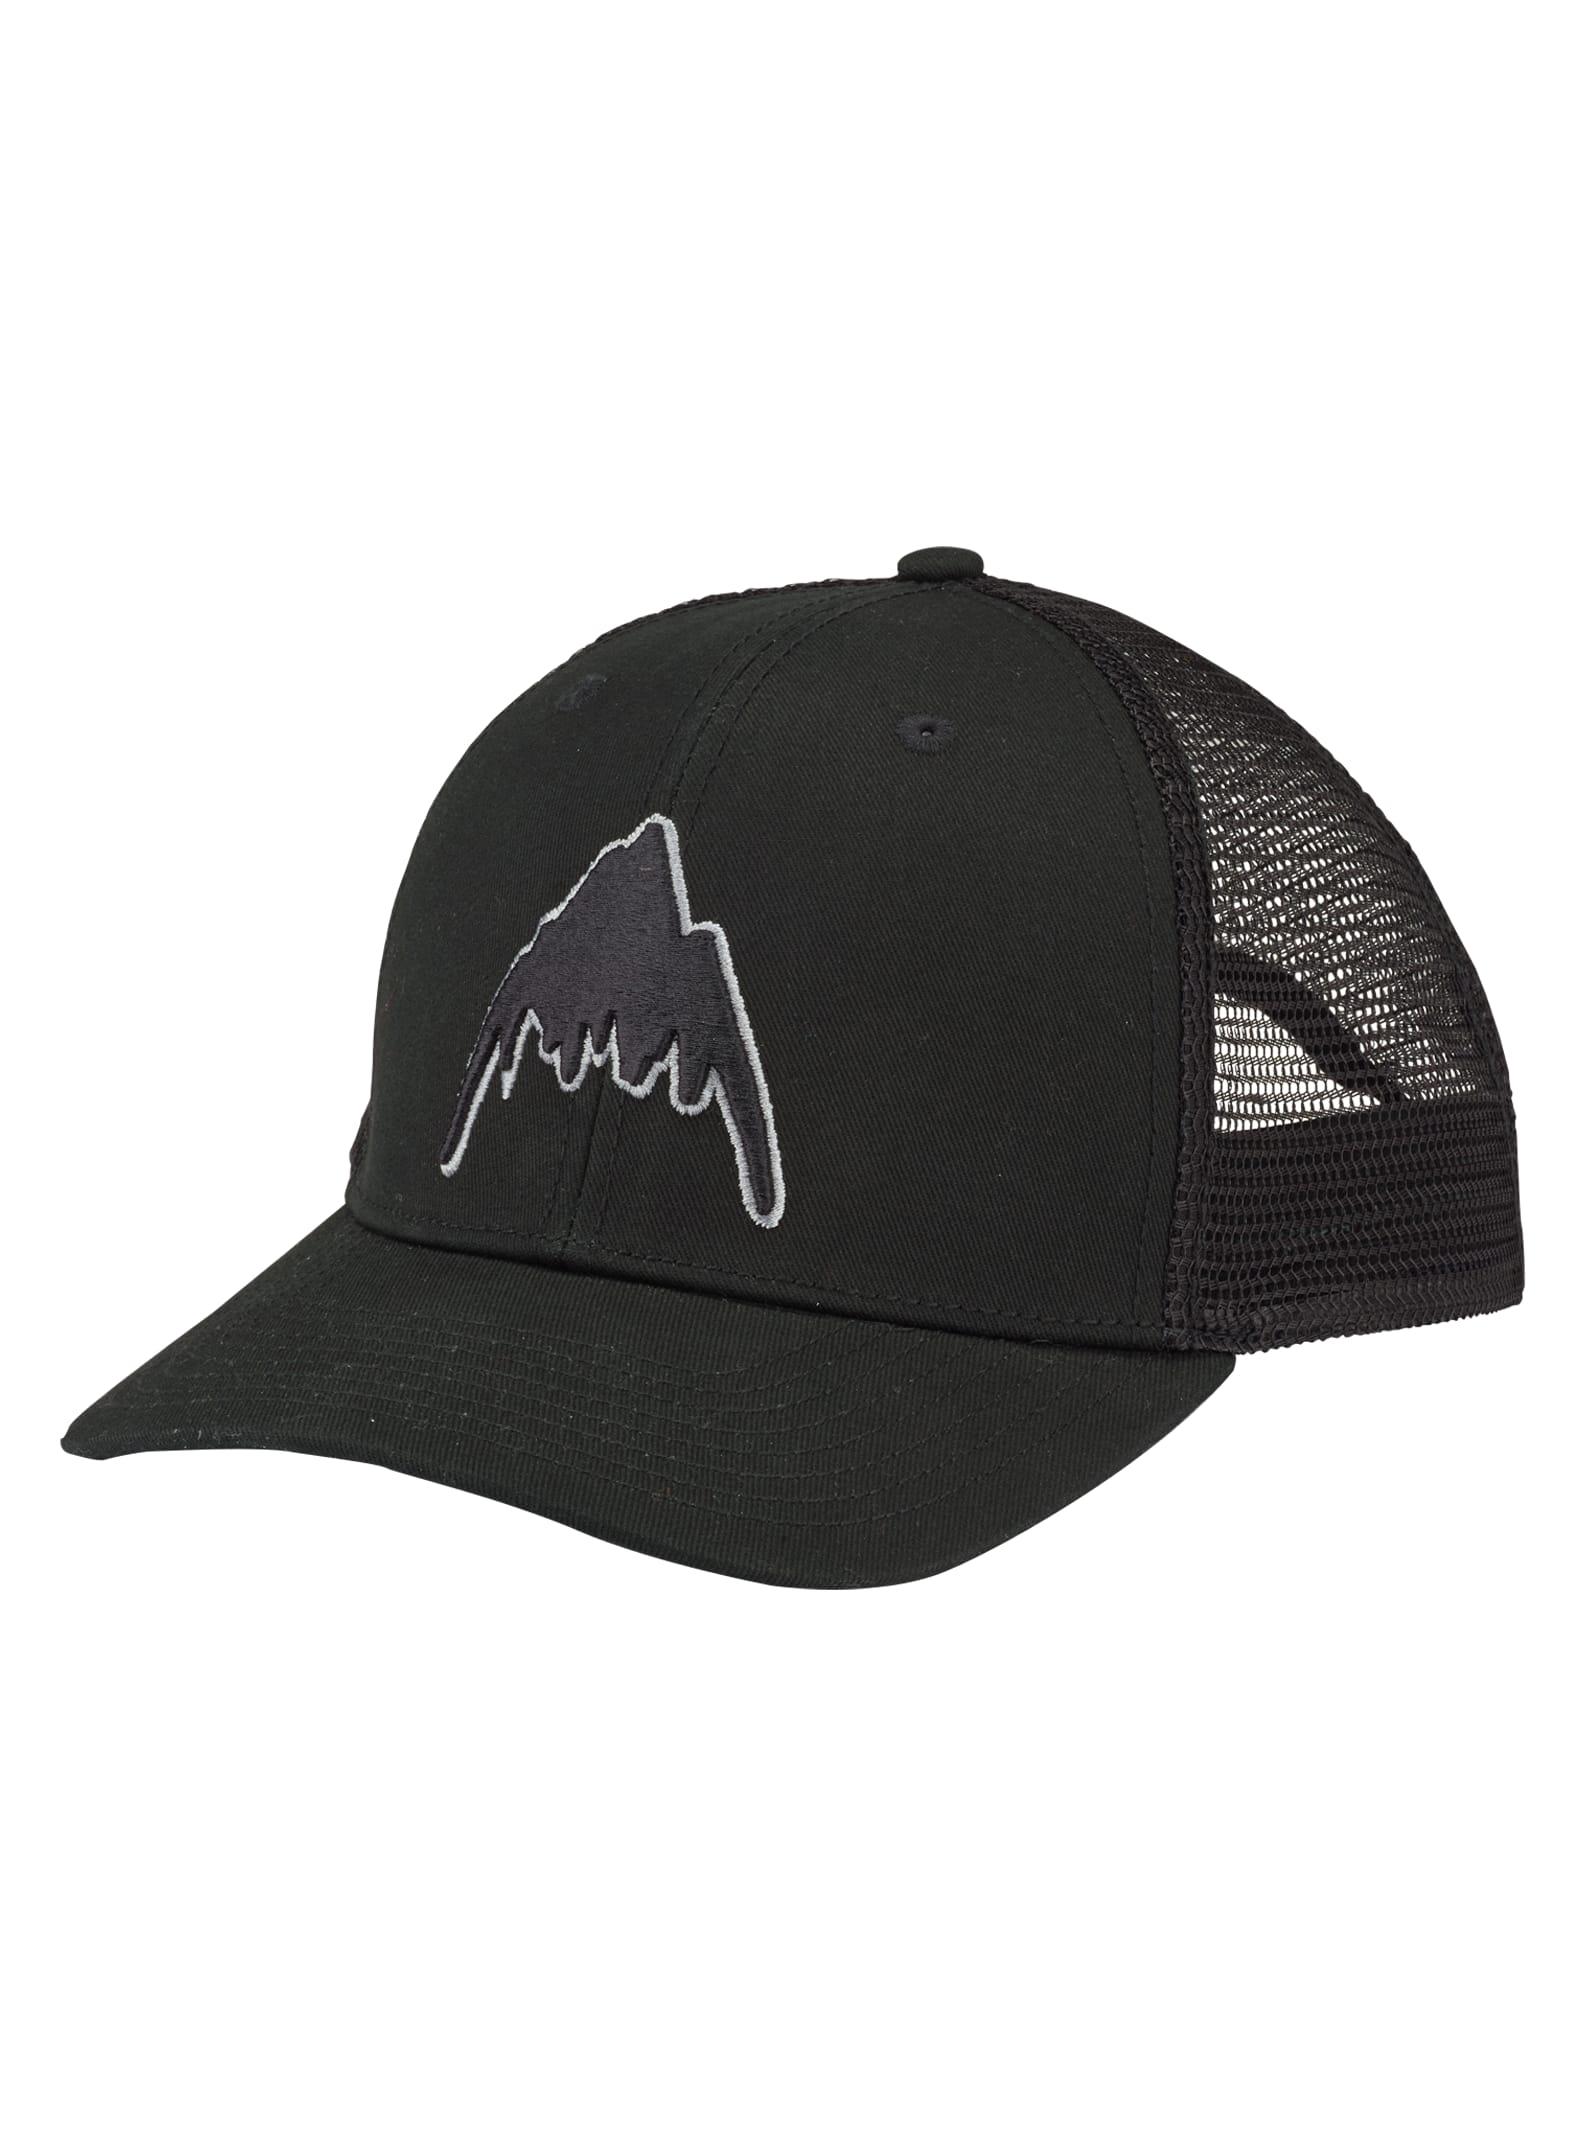 018bc44614d Men s Hats   Beanies